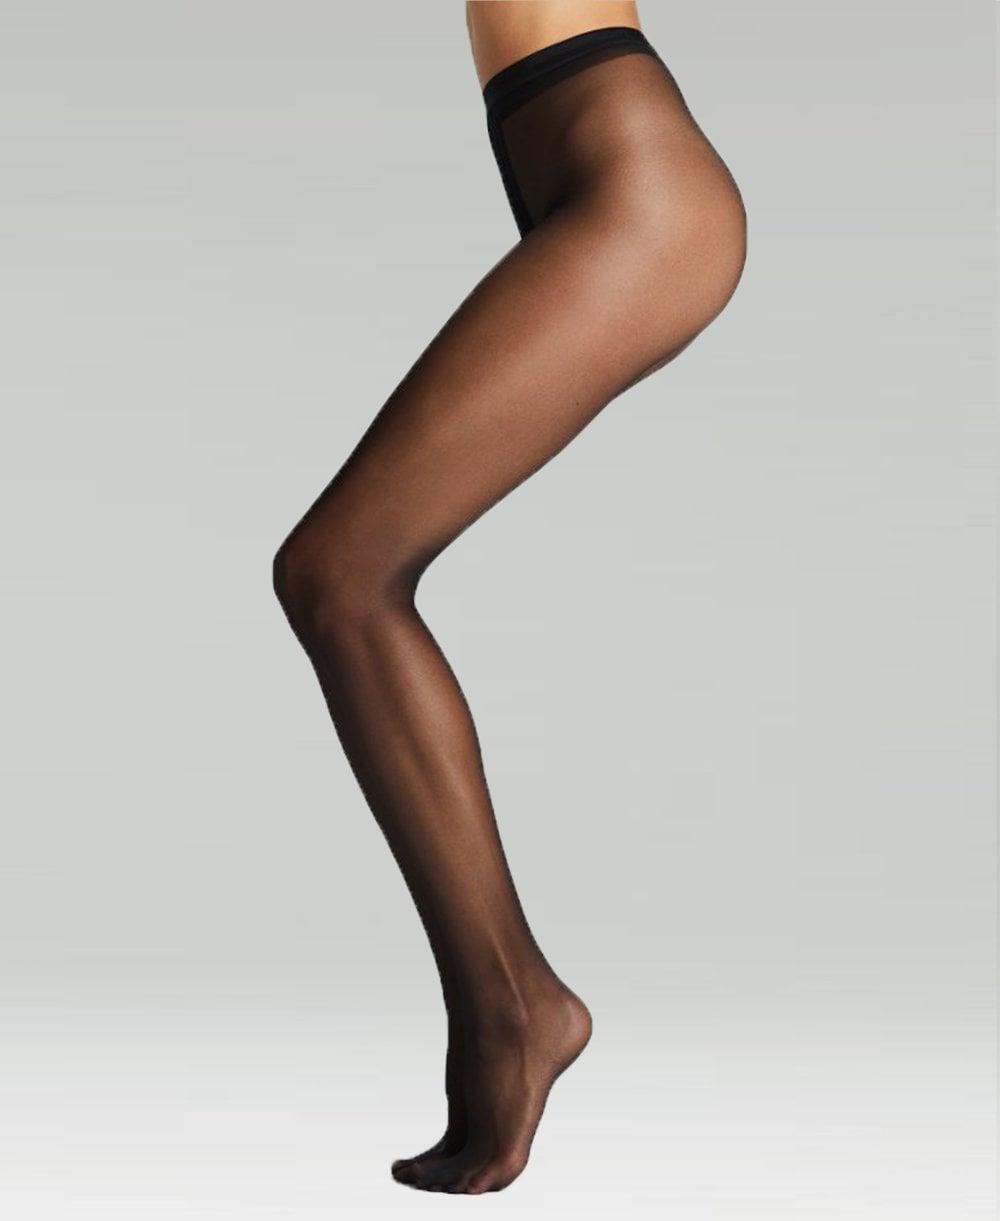 c87d1051e8d Fogal Brilliance 20 Denier Tights - Tights from luxury-legs.com UK